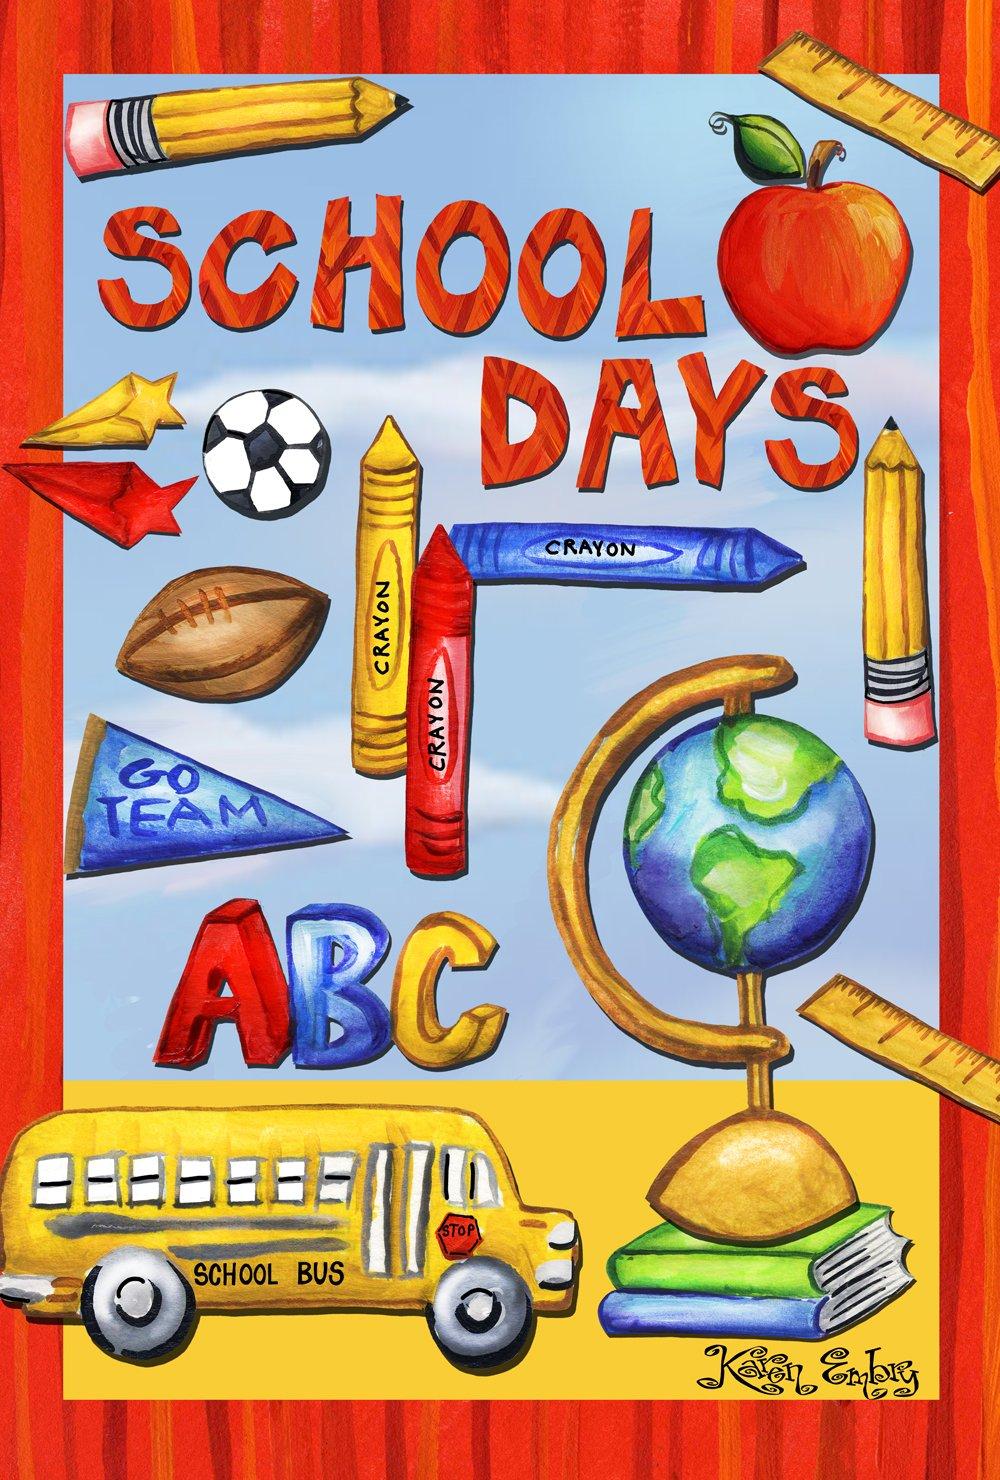 Toland Home Garden Classroom Collage 12.5 x 18 Inch Decorative Colorful School Days Bus Crayon Sports Garden Flag